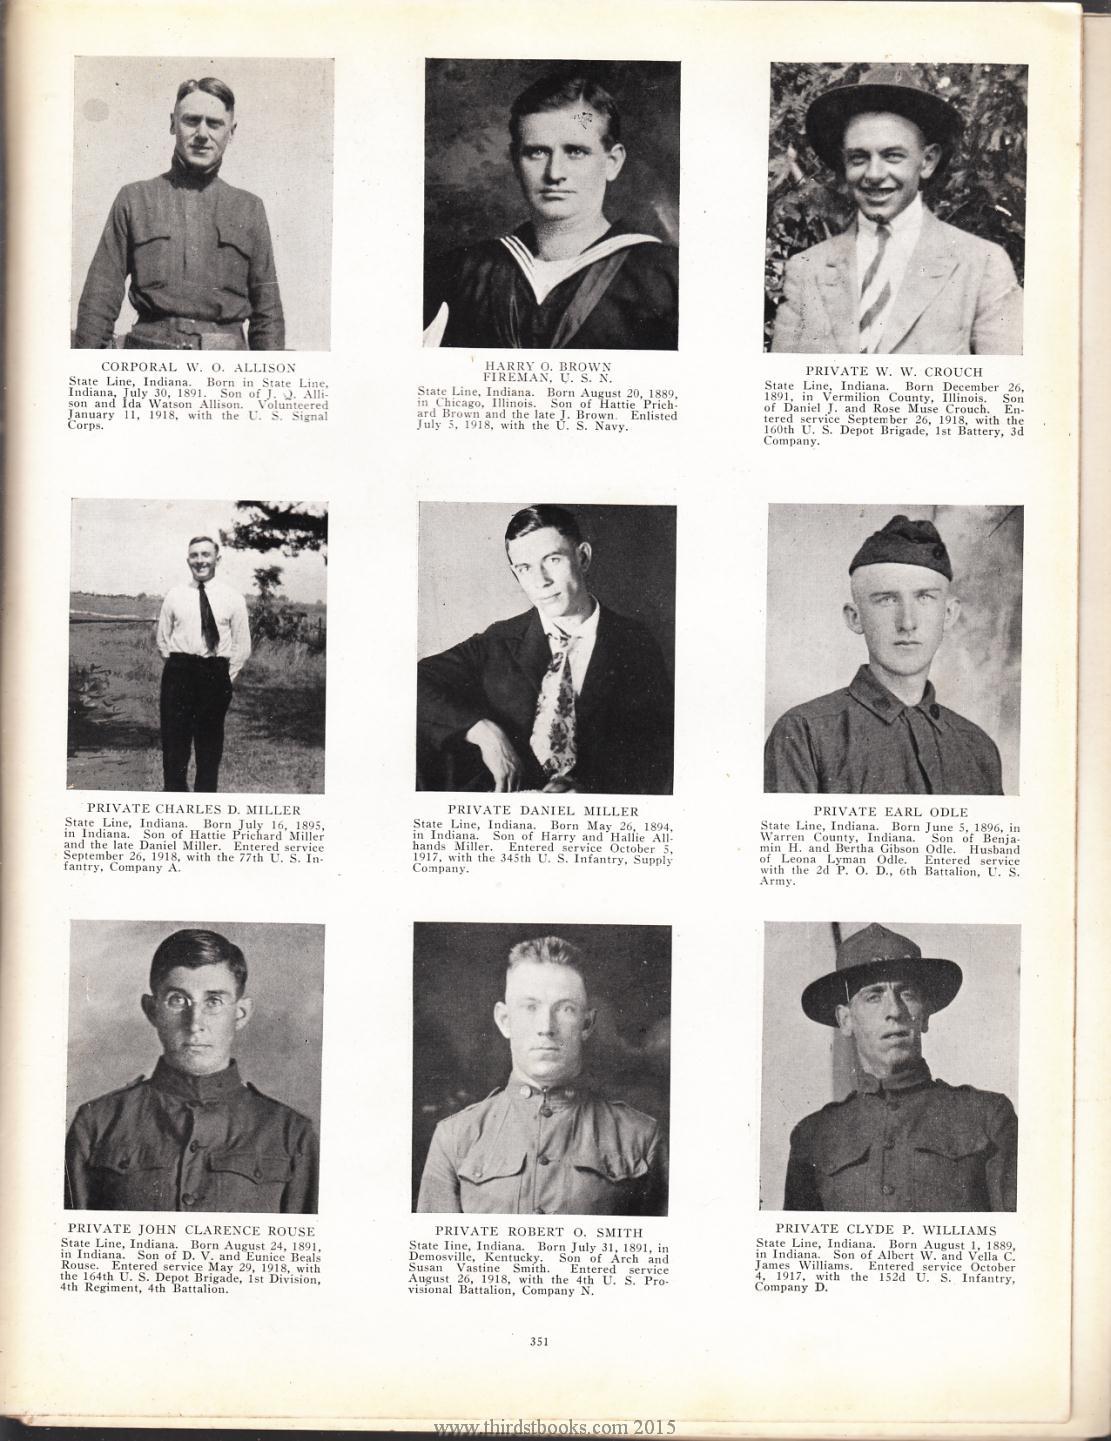 Illinois vermilion county muncie - W O Allison Page 351